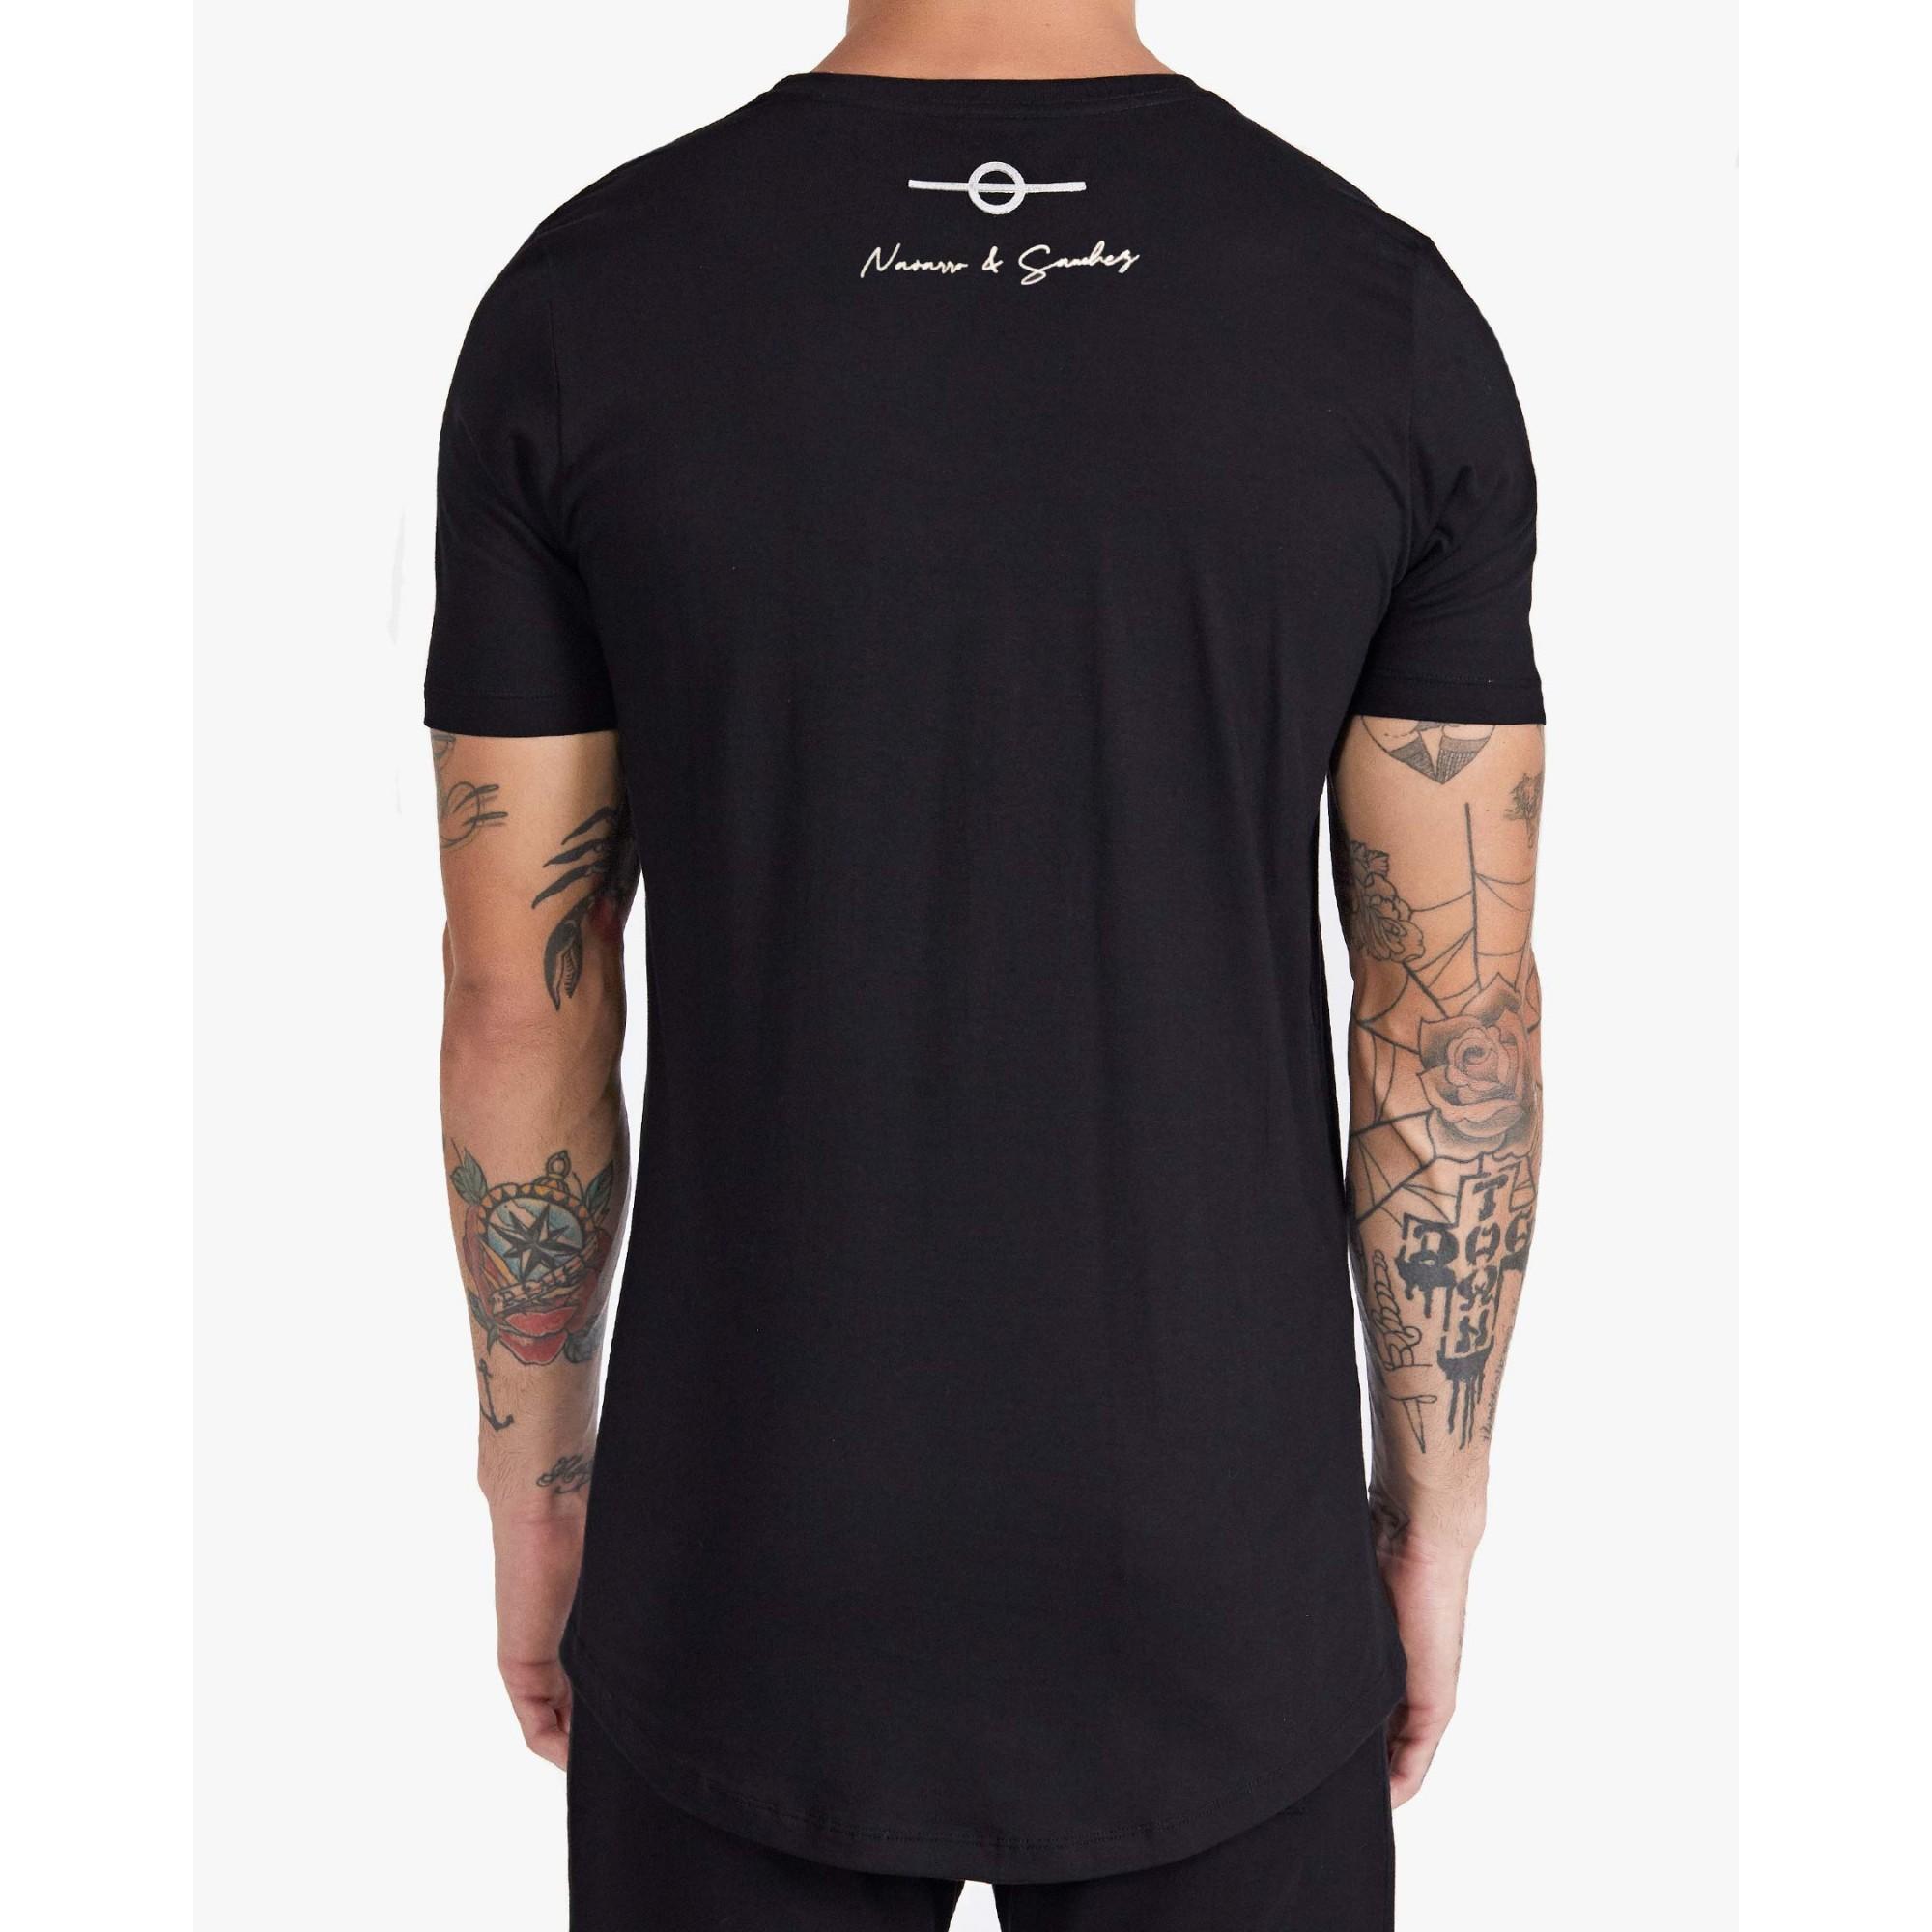 Camiseta Buh Cordão Penta Black